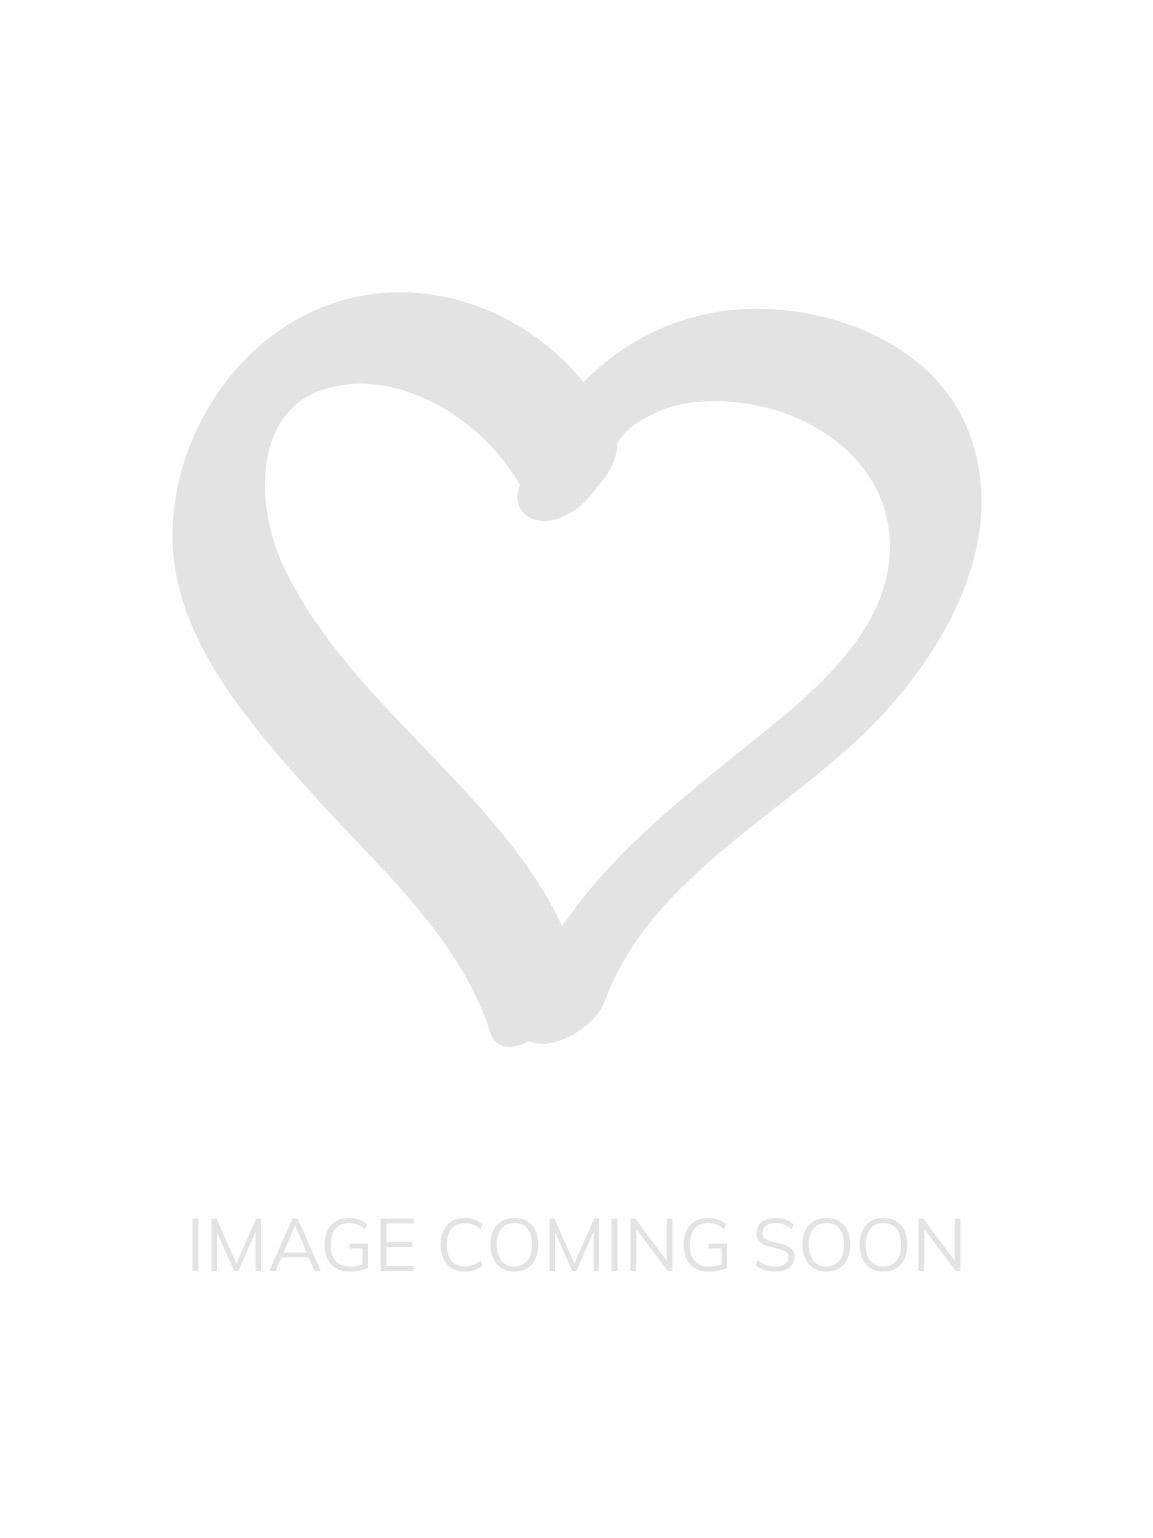 ab1201af261 Fiore Full Cup Bra - Raspberry Gold